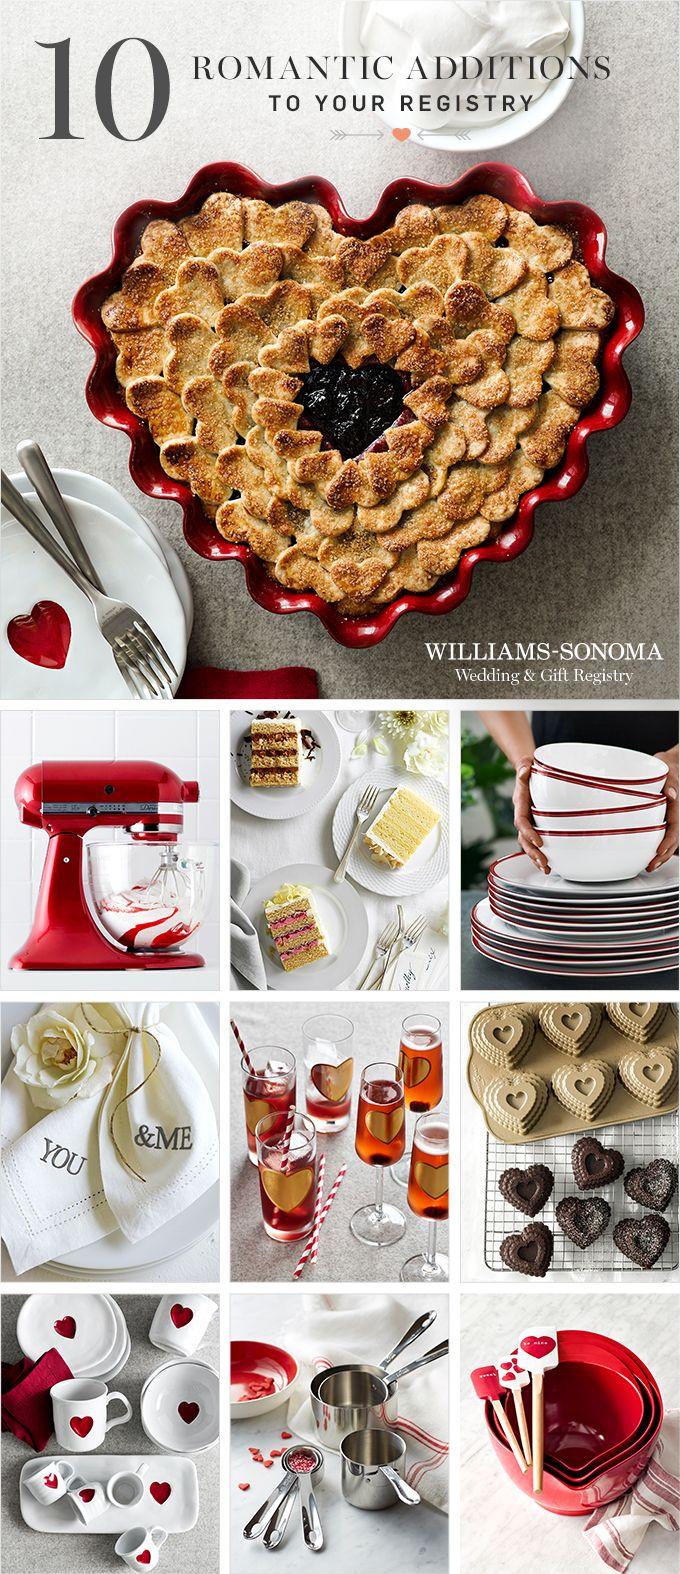 Wedding Registry Bridal Registry Gift Registry Valentines Food Valentines Day Food Holiday Recipes